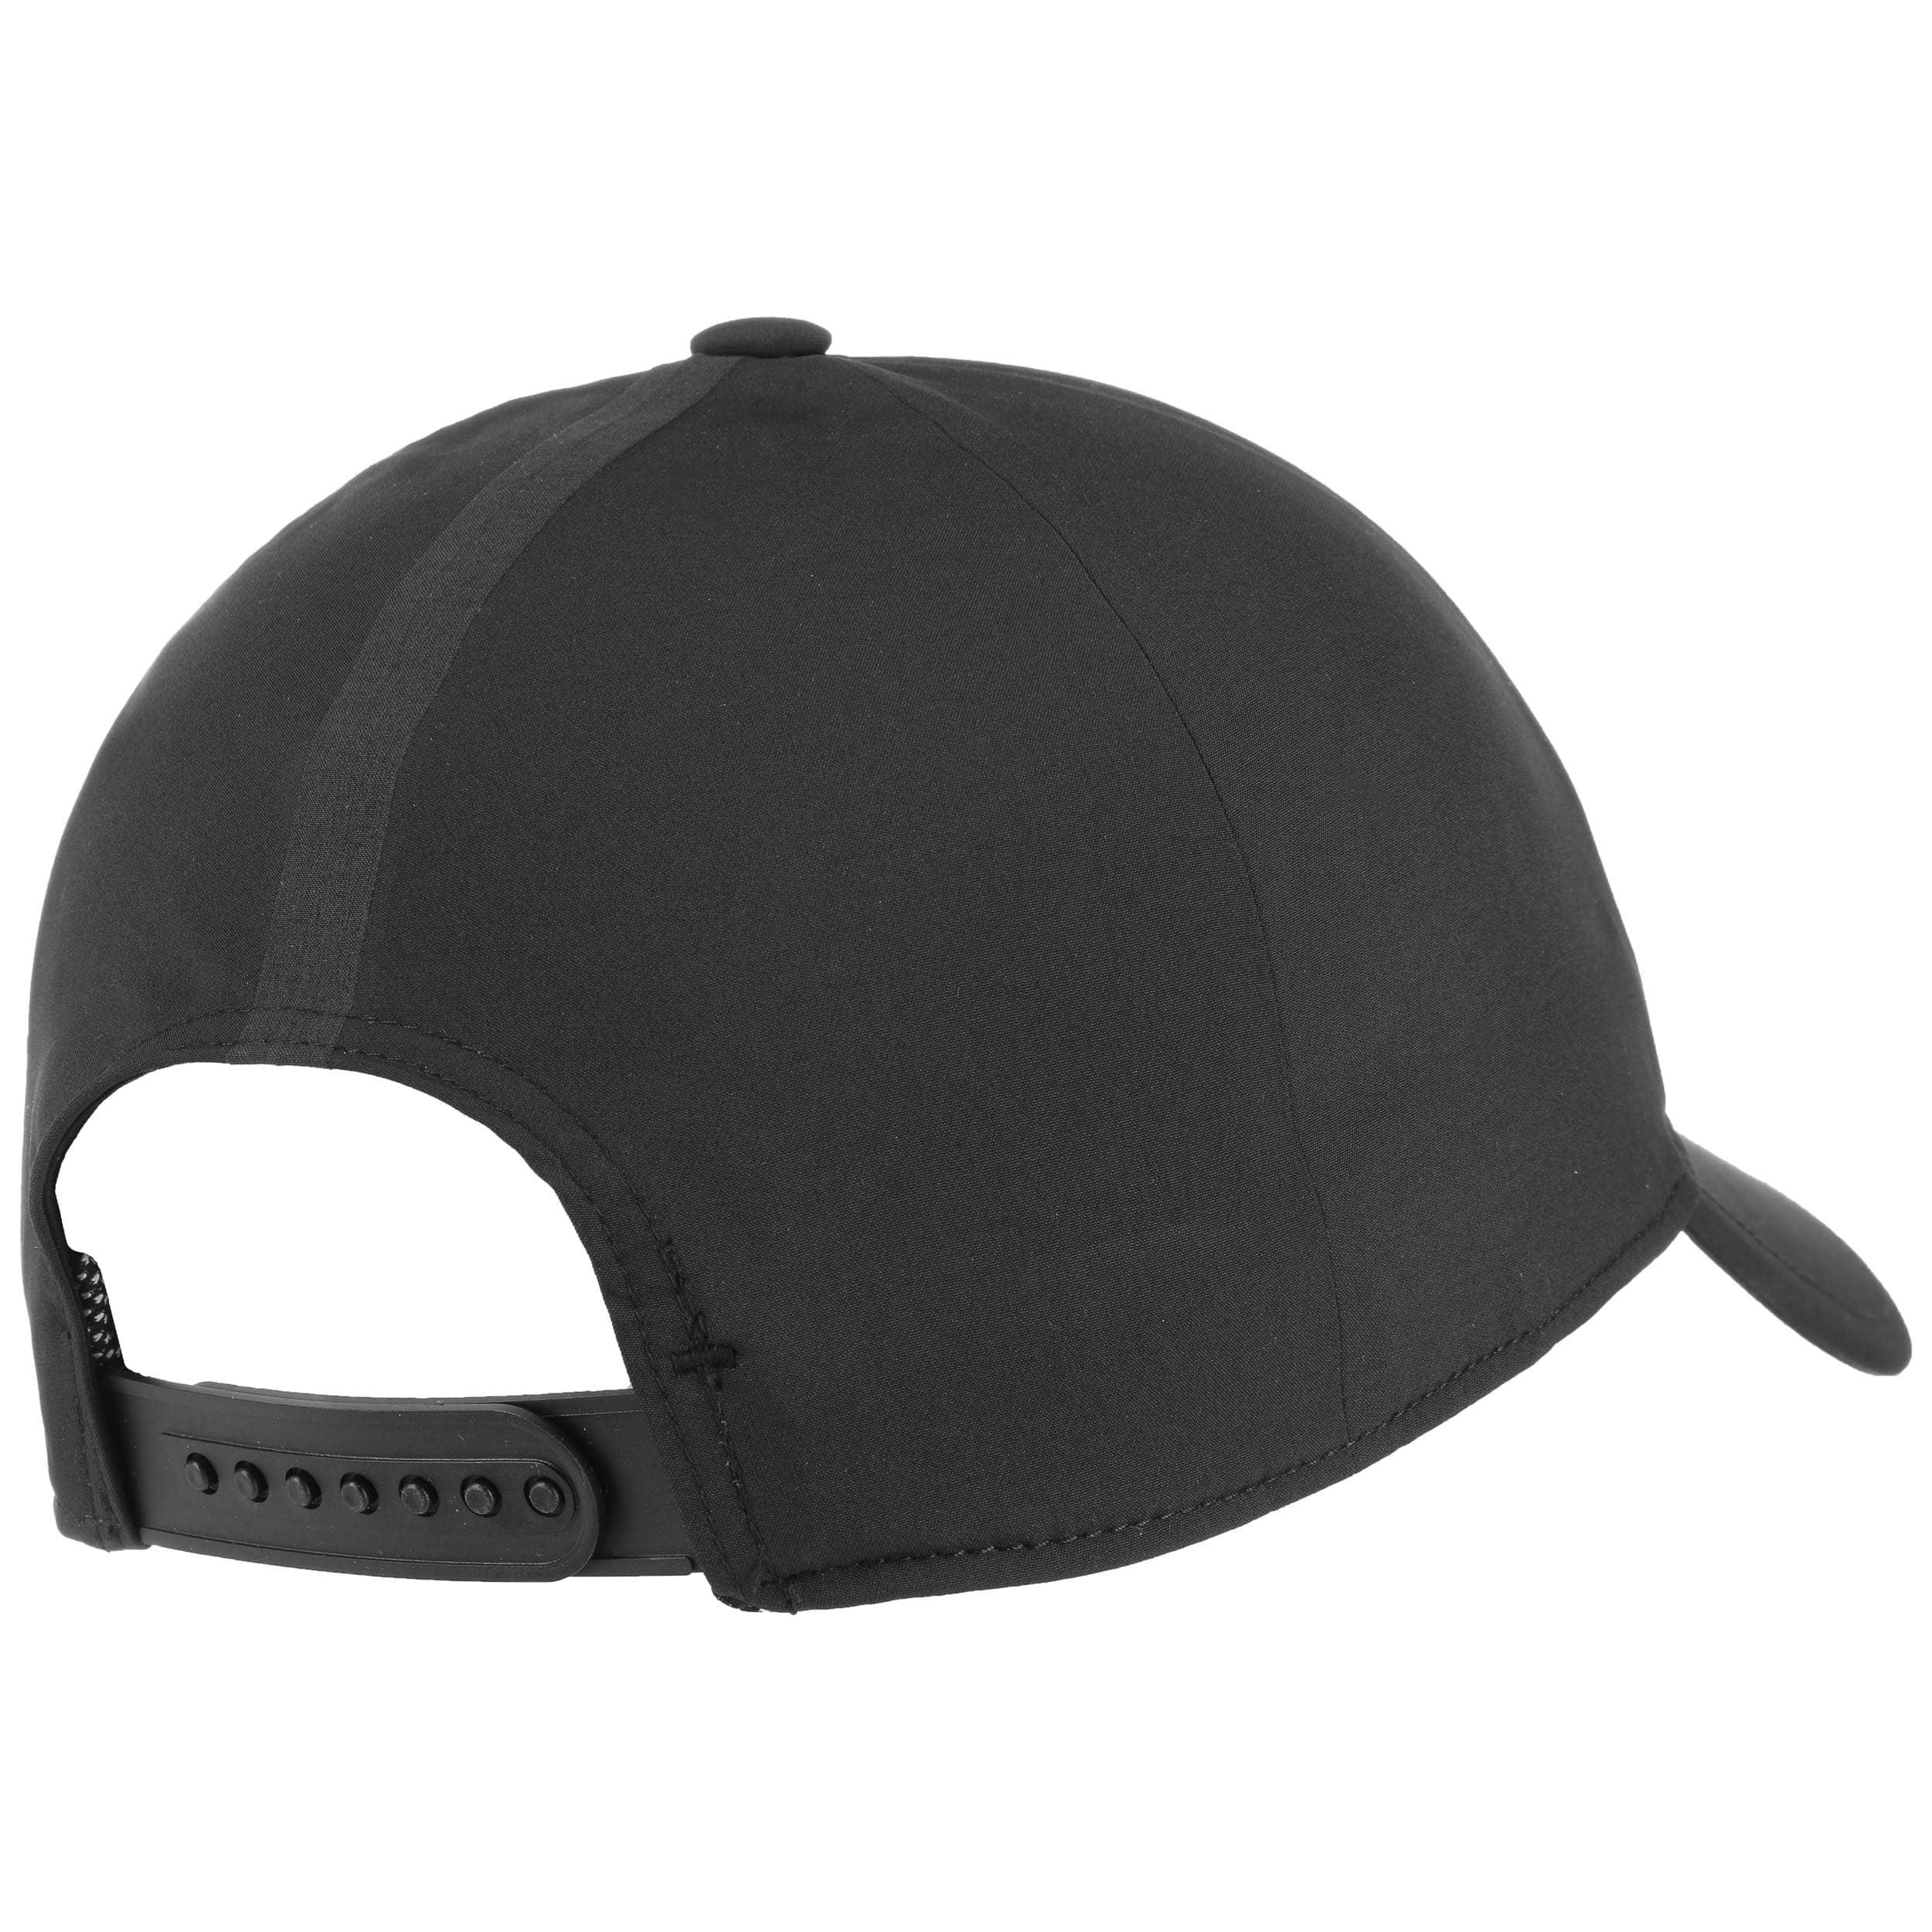 cappello uomo adidas nero